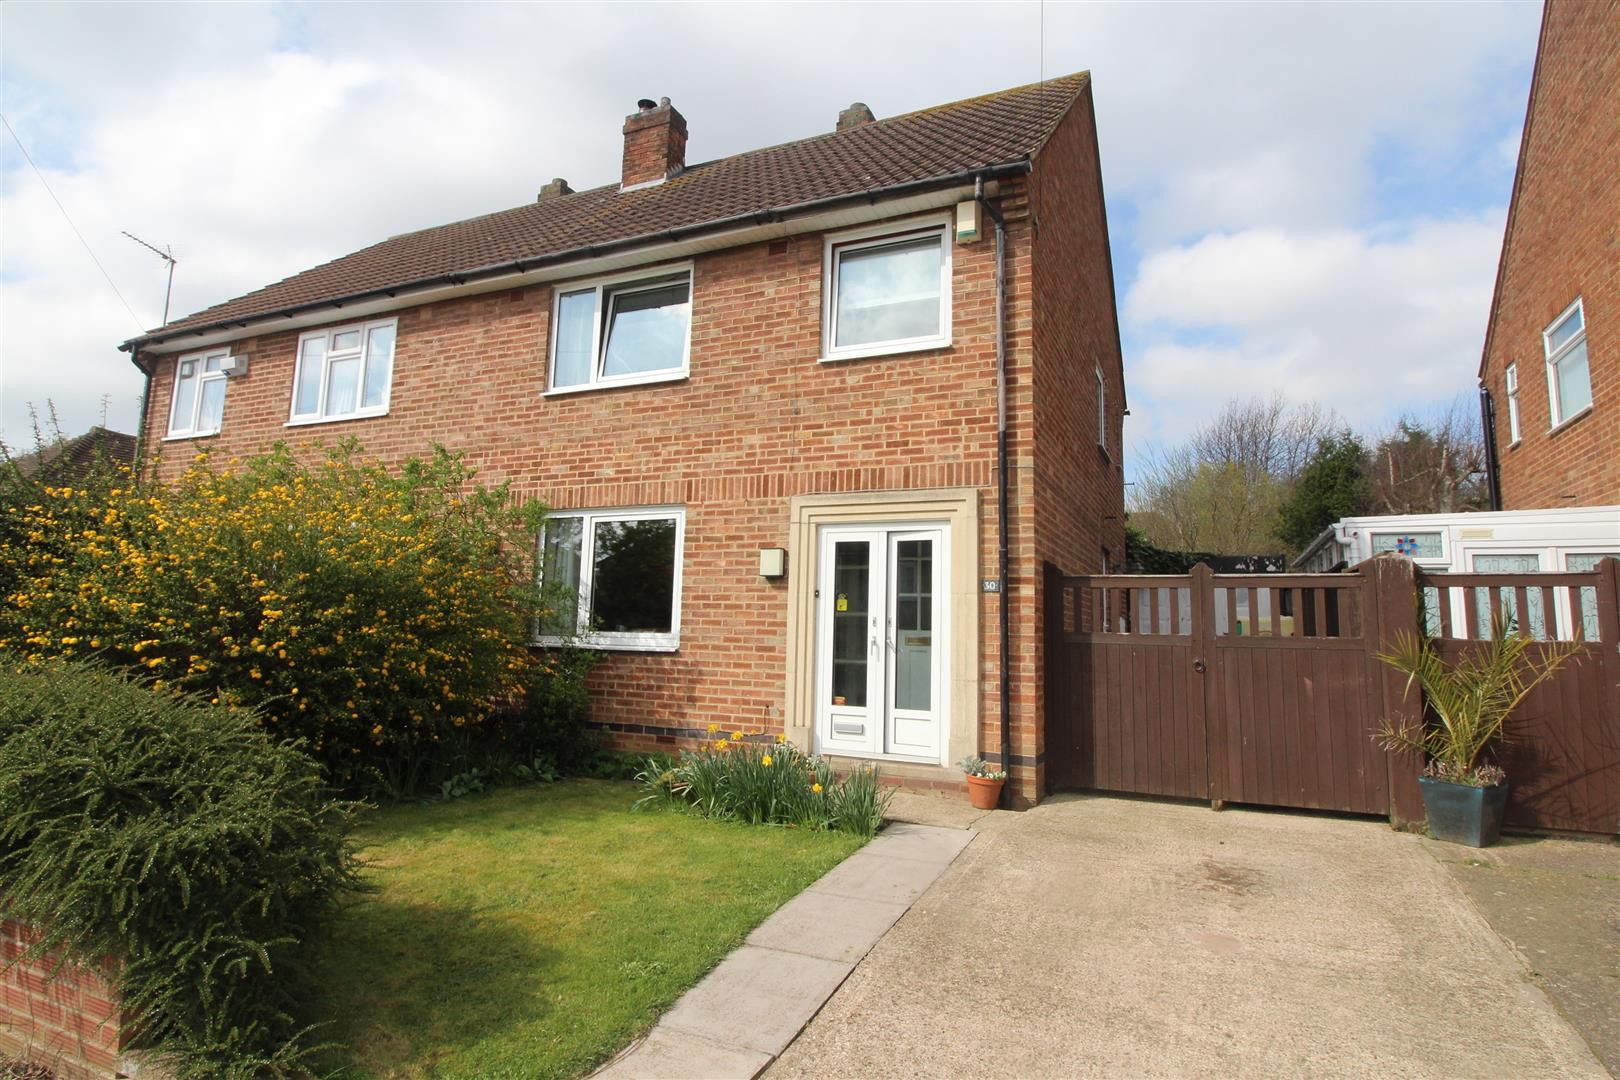 3 Bedrooms House for sale in Western Way, Wellingborough